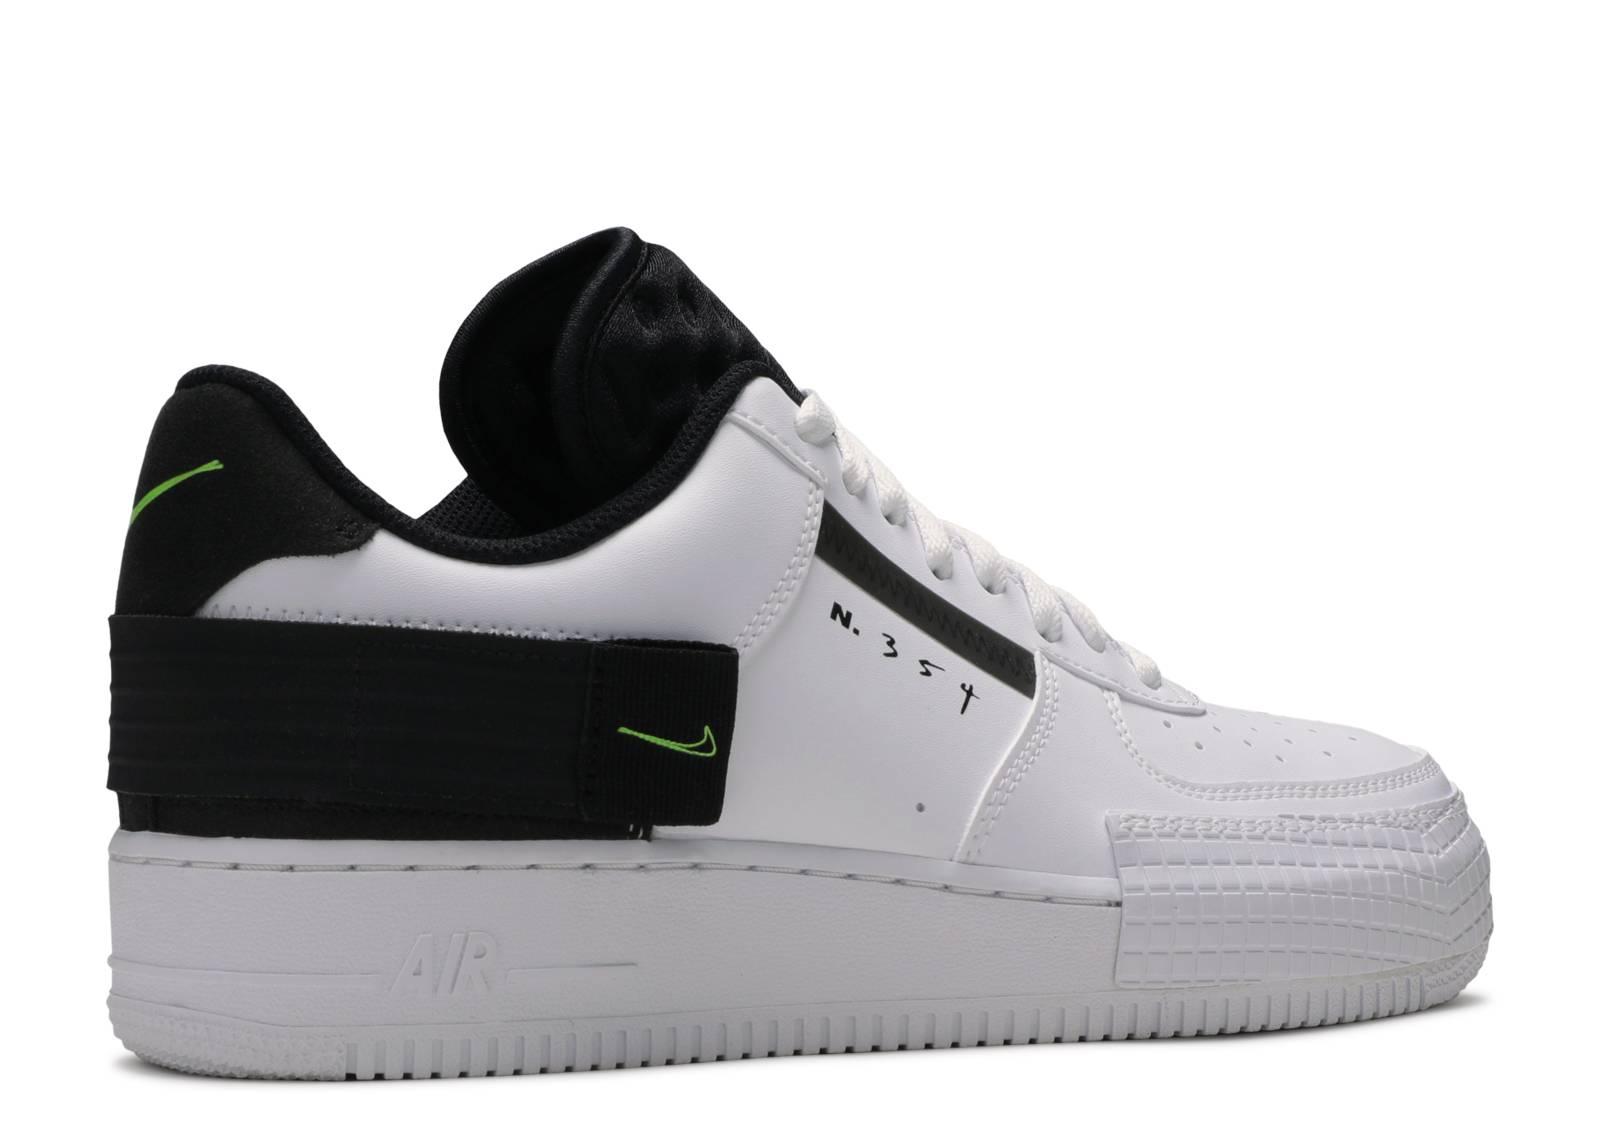 Sinewi Línea de visión fantasma  Air Force 1 Type 'Volt' - Nike - AT7859 101 - white/volt/black/white |  Flight Club